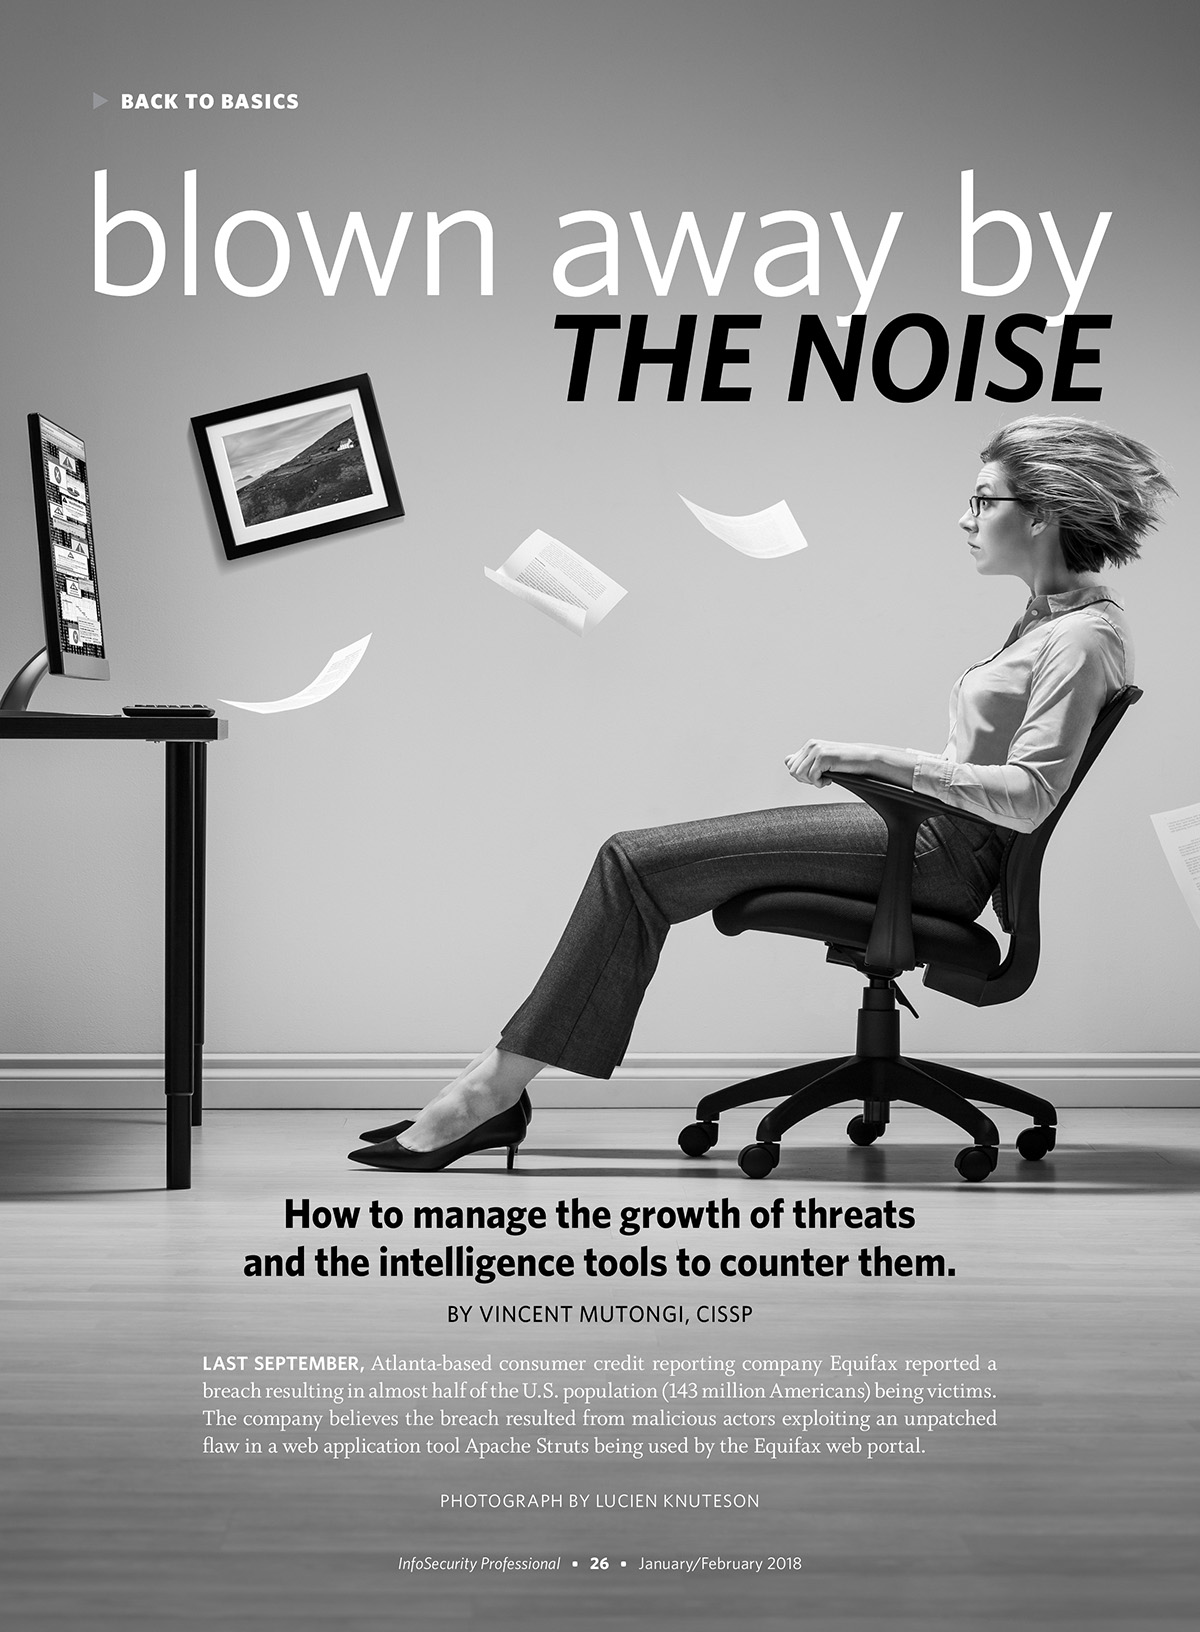 Winning magazine design of woman at a computer